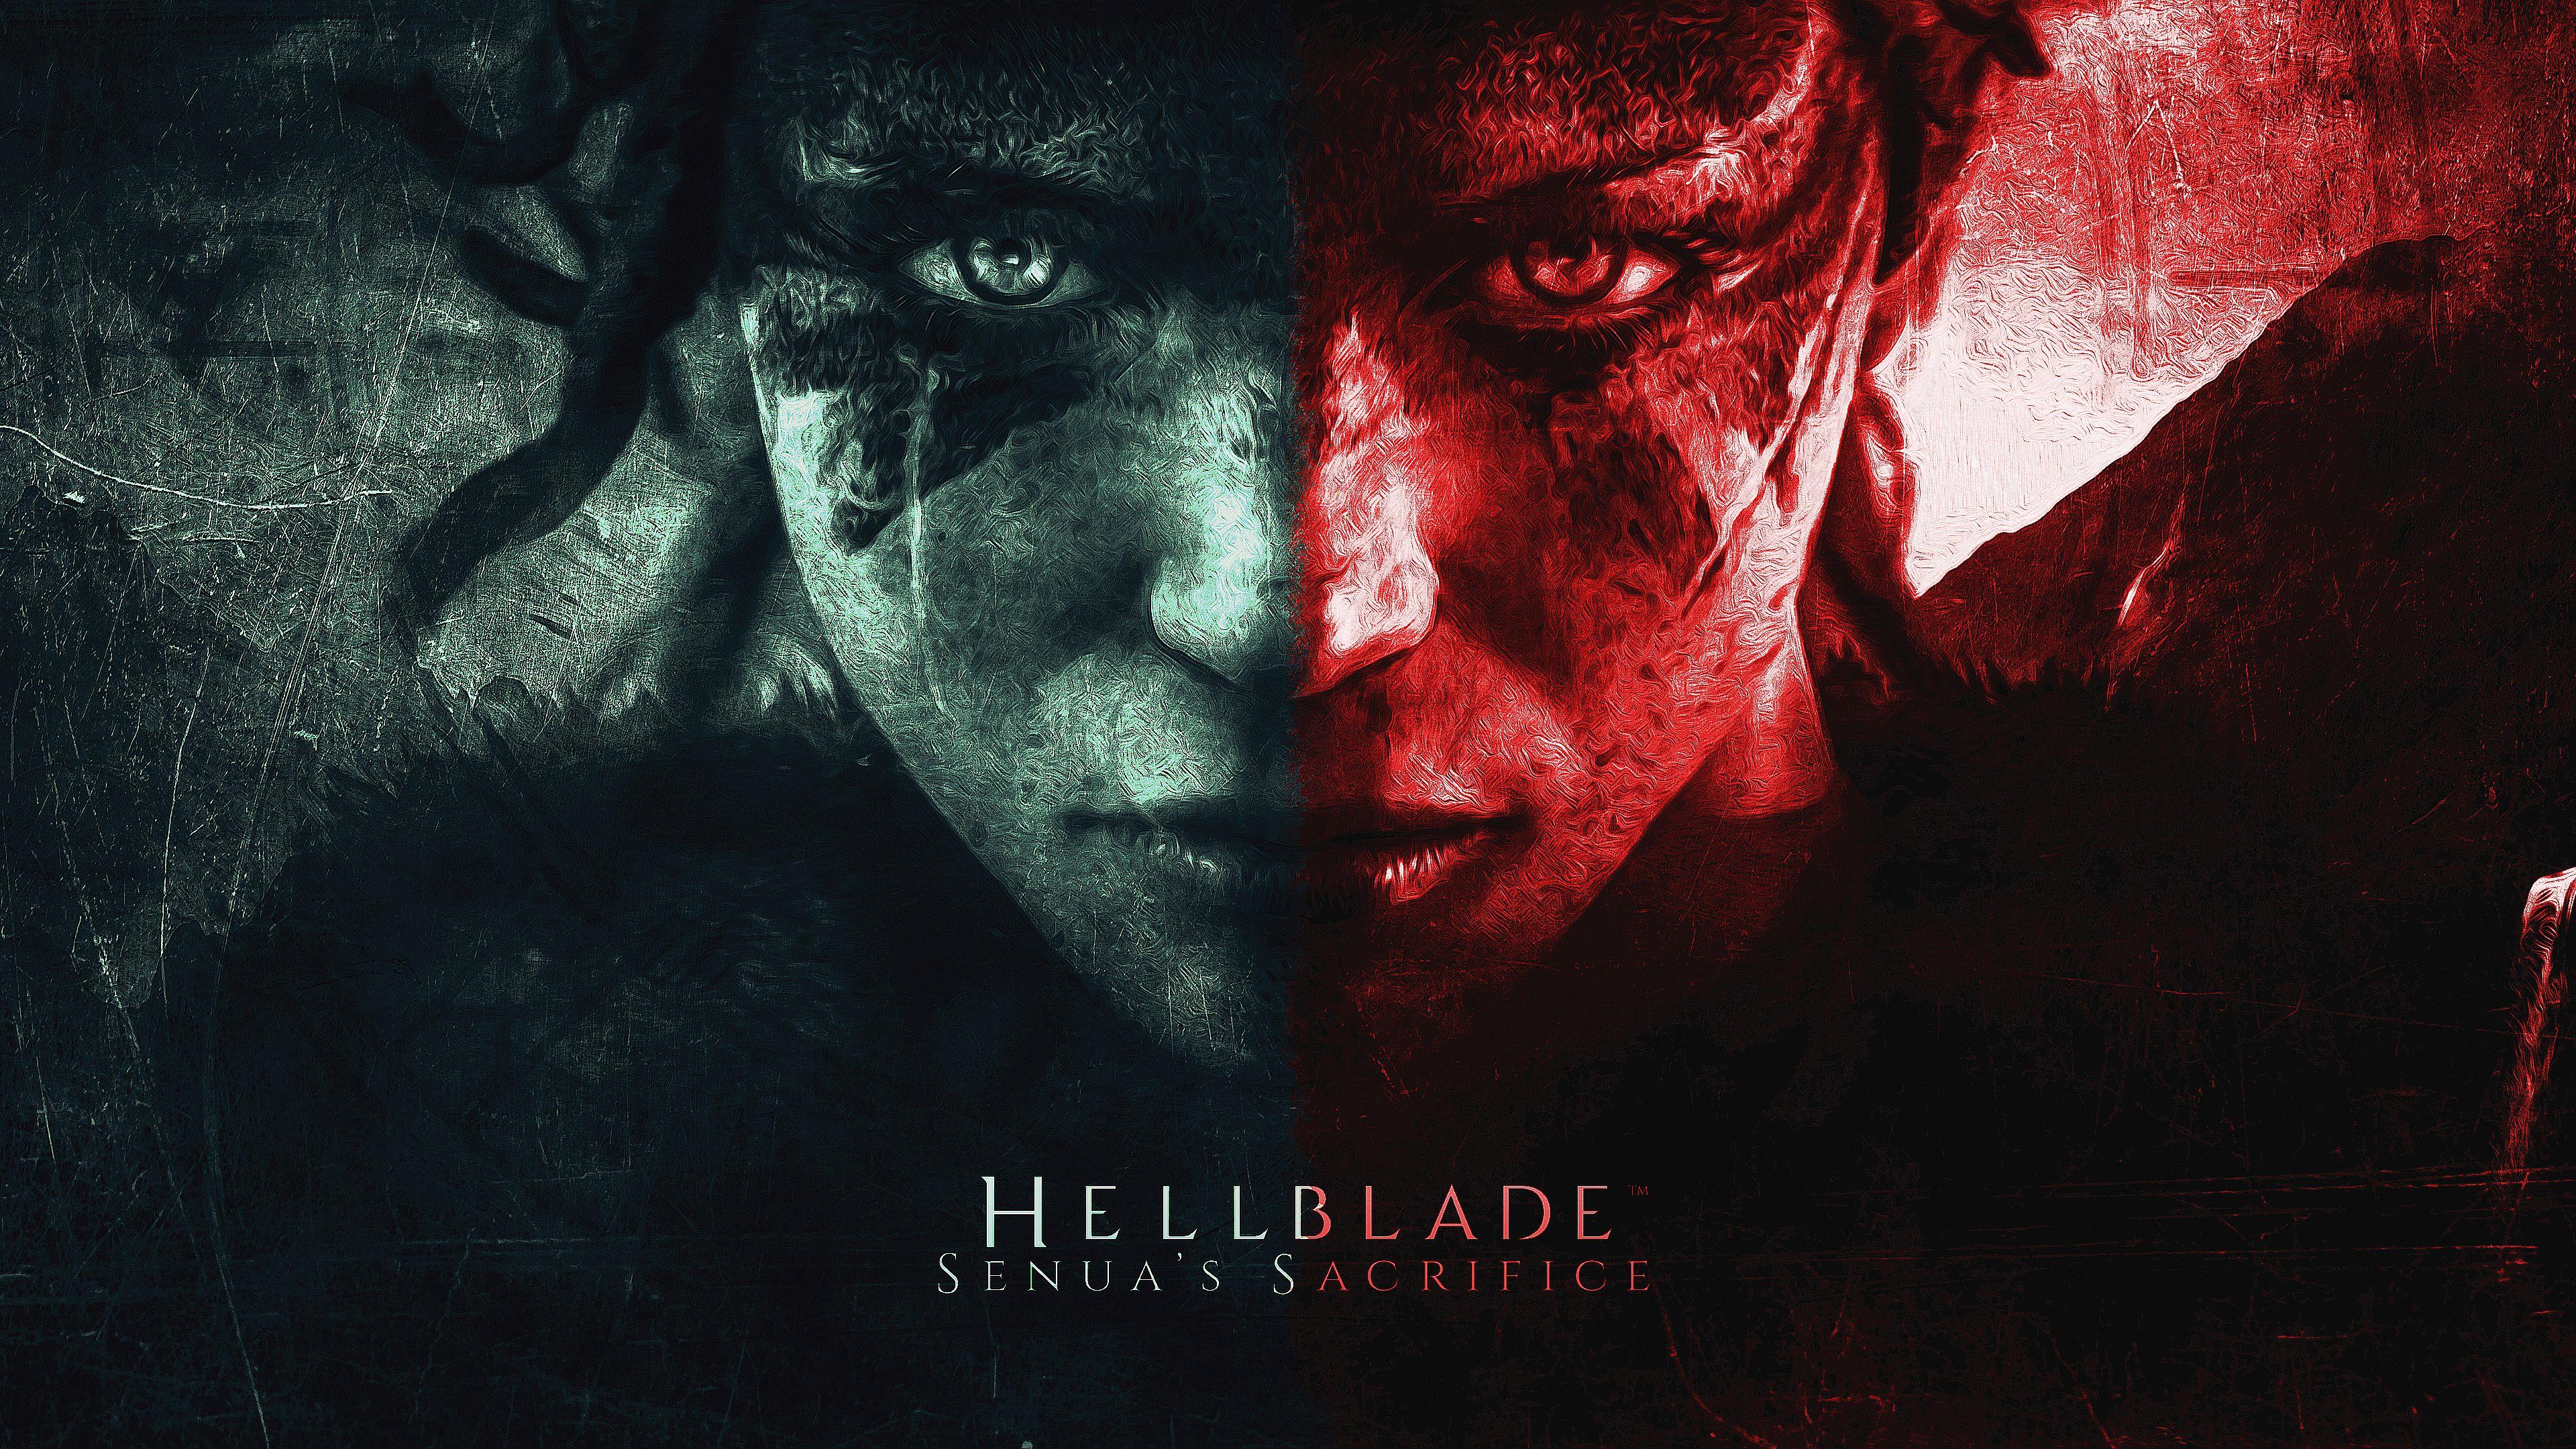 Hellblade Senuas Sacrifice 4k 2018 Wallpaper